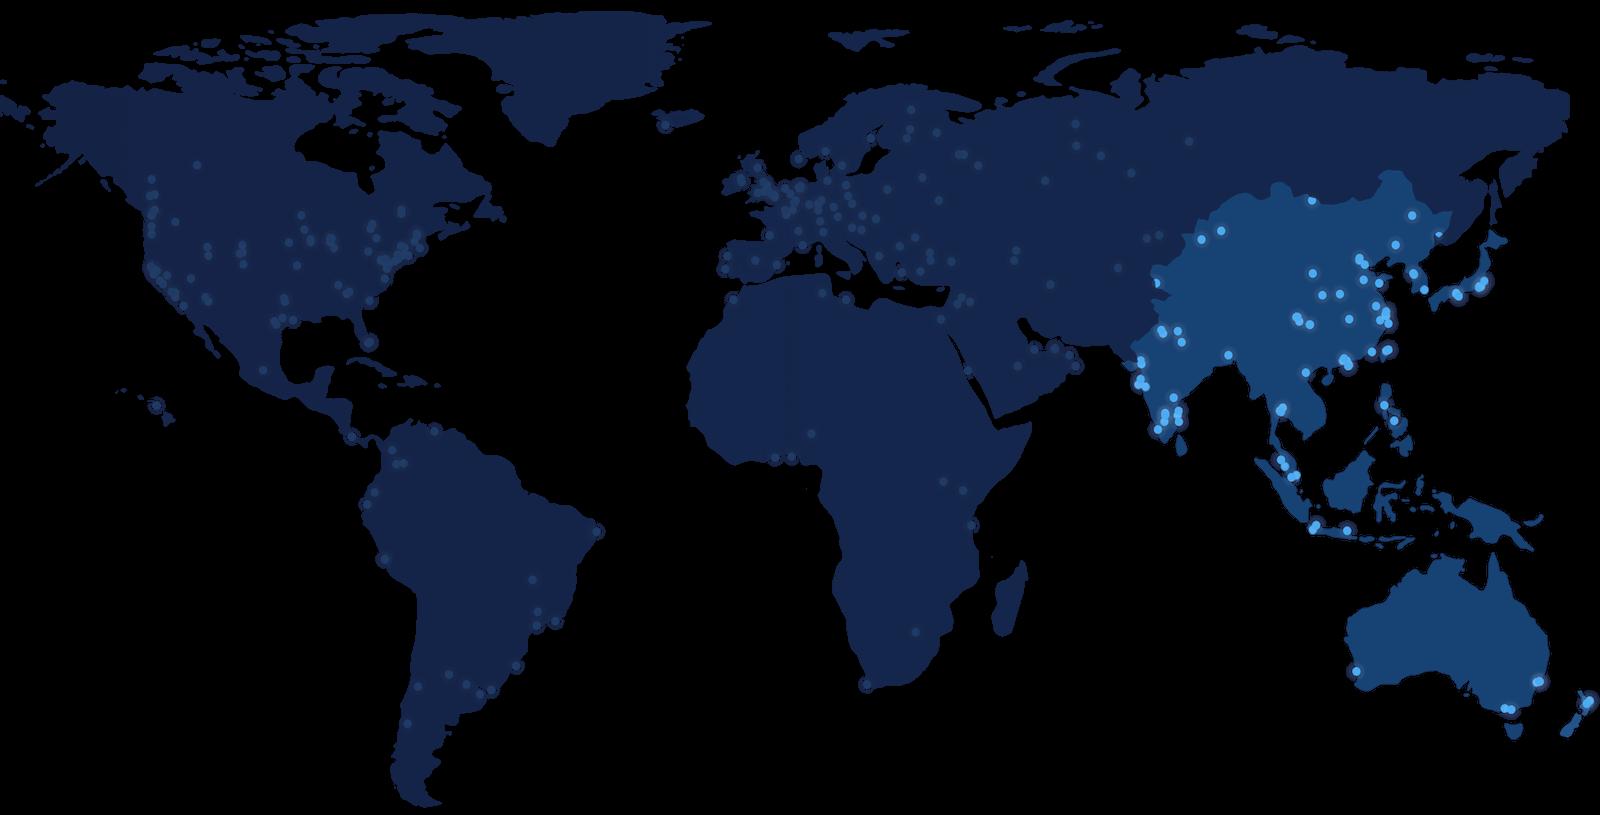 catchpoint-node-coverage-apac-region